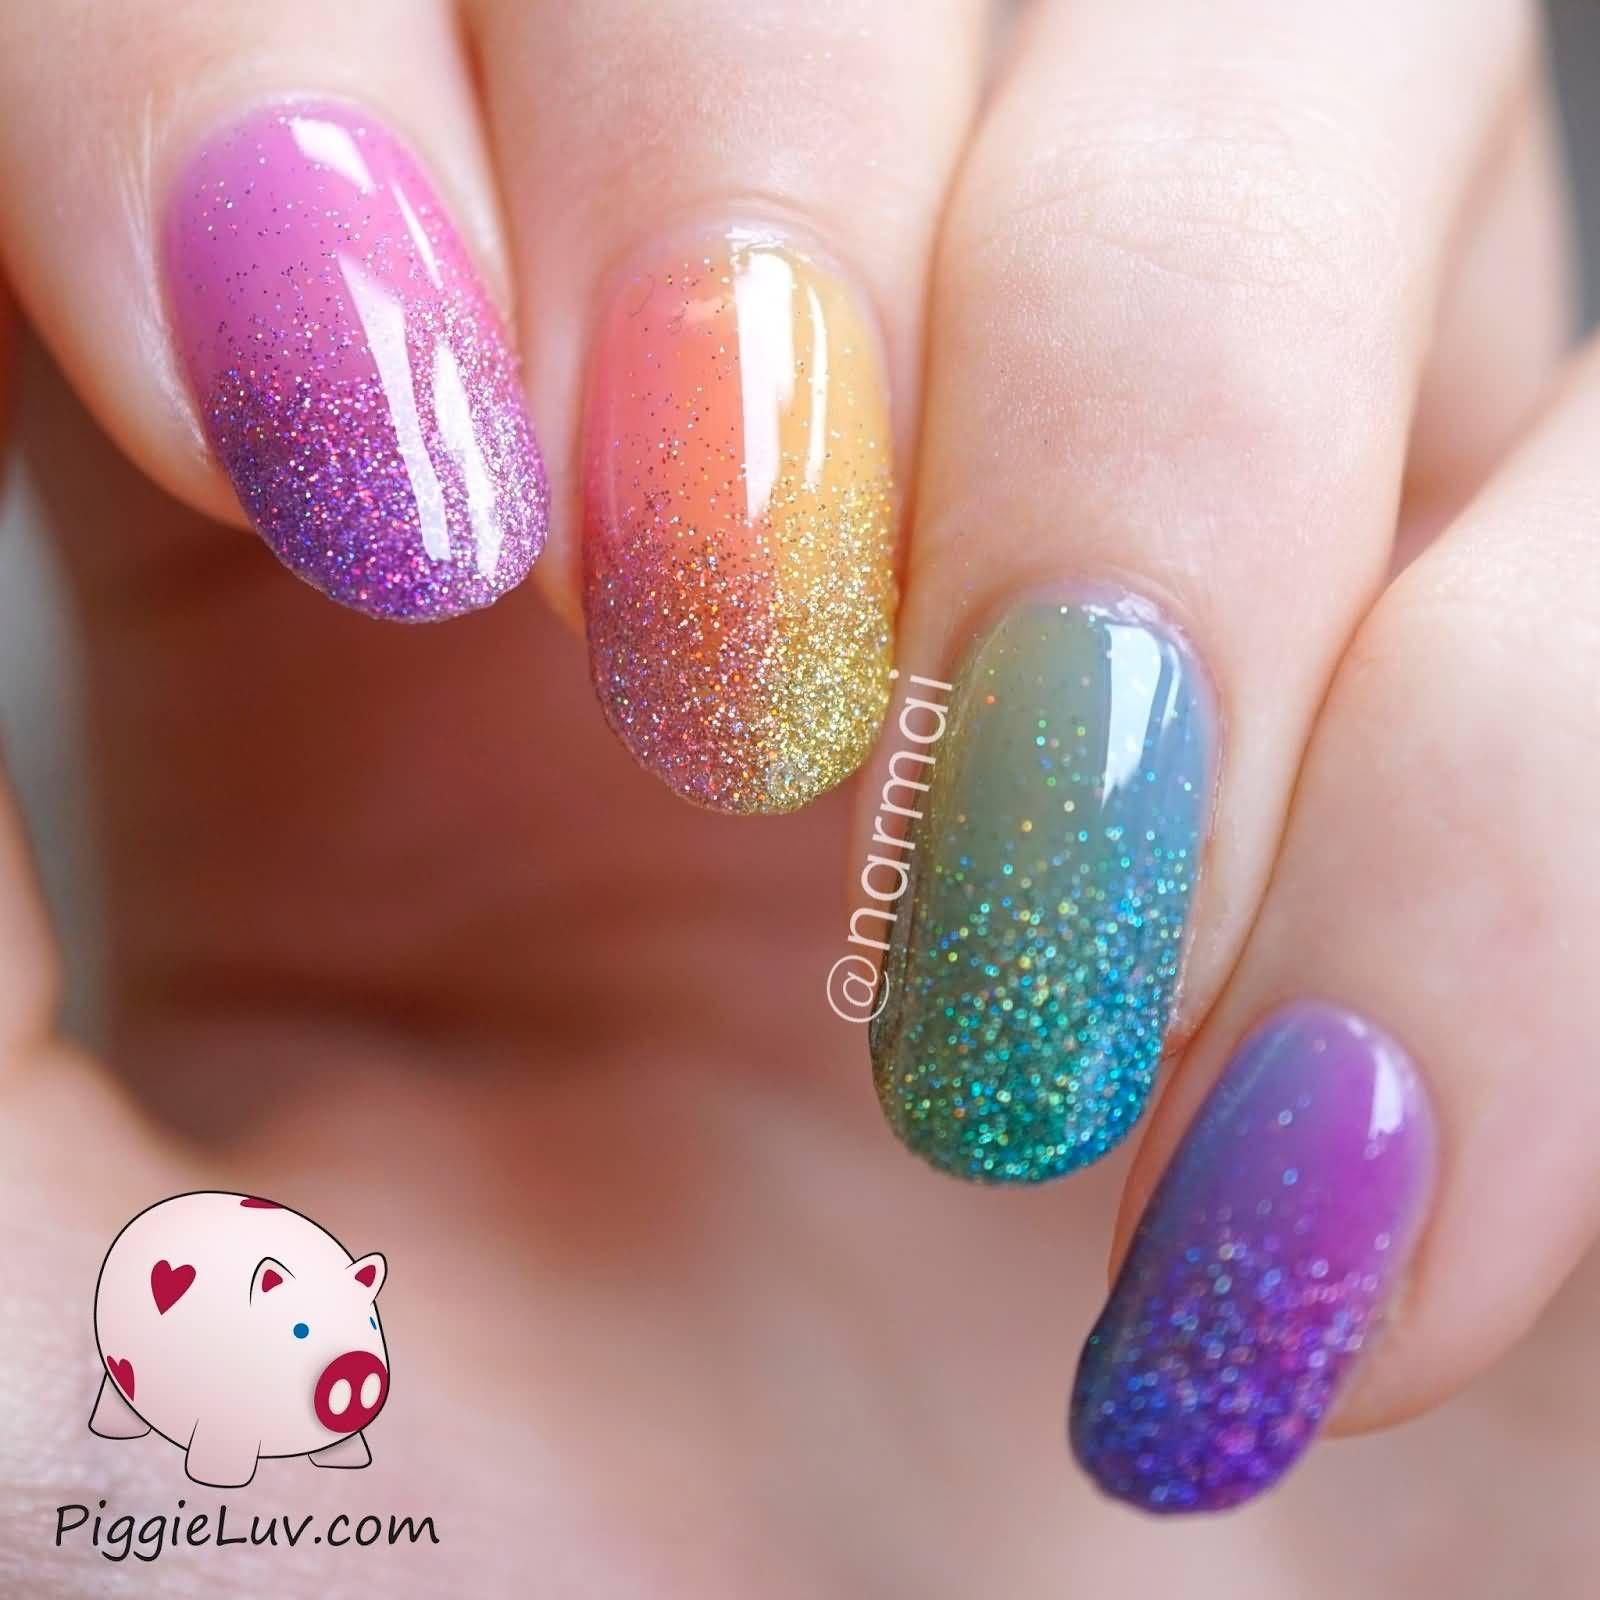 Black Tip And Pink Glitter Gel Nail Art Design Idea | nail ...